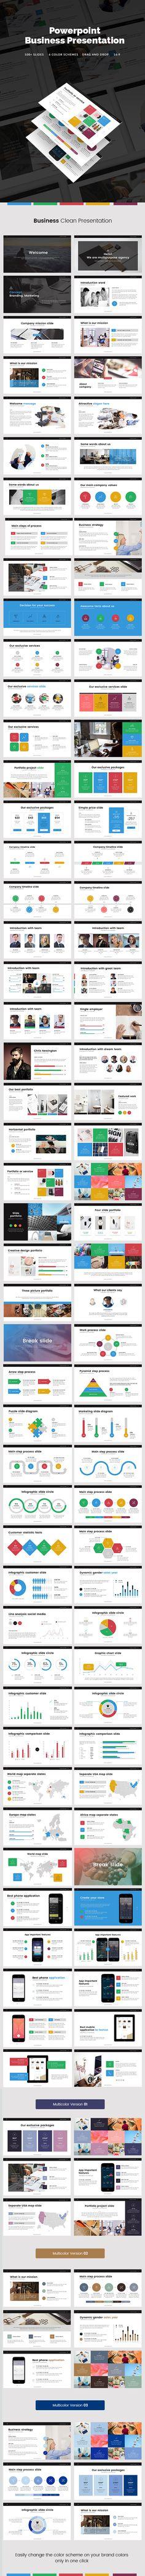 Business Presentation — Powerpoint PPT #presentation #infographics • Download ➝ https://graphicriver.net/item/business-presentation/19428585?ref=pxcr